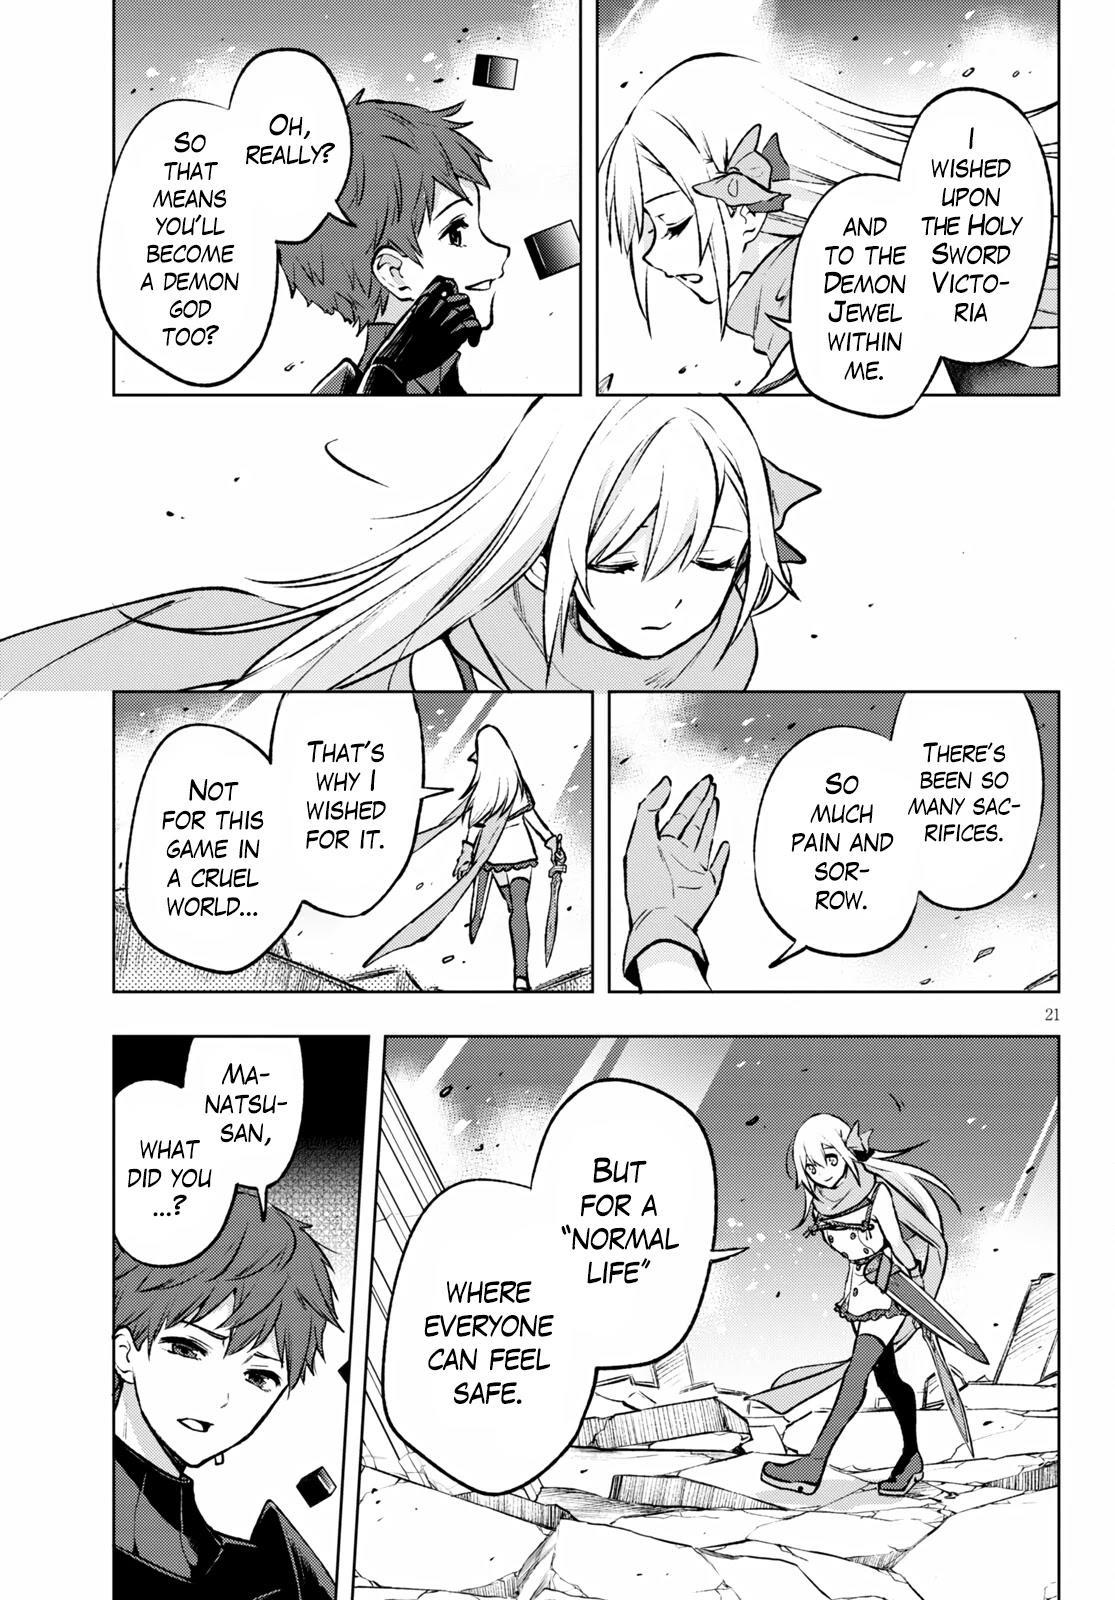 Samayoeru Tensei-Sha-Tachi No Revival Game Chapter 24: Manatsu, Messenger Of The Holy God page 19 - Mangakakalots.com